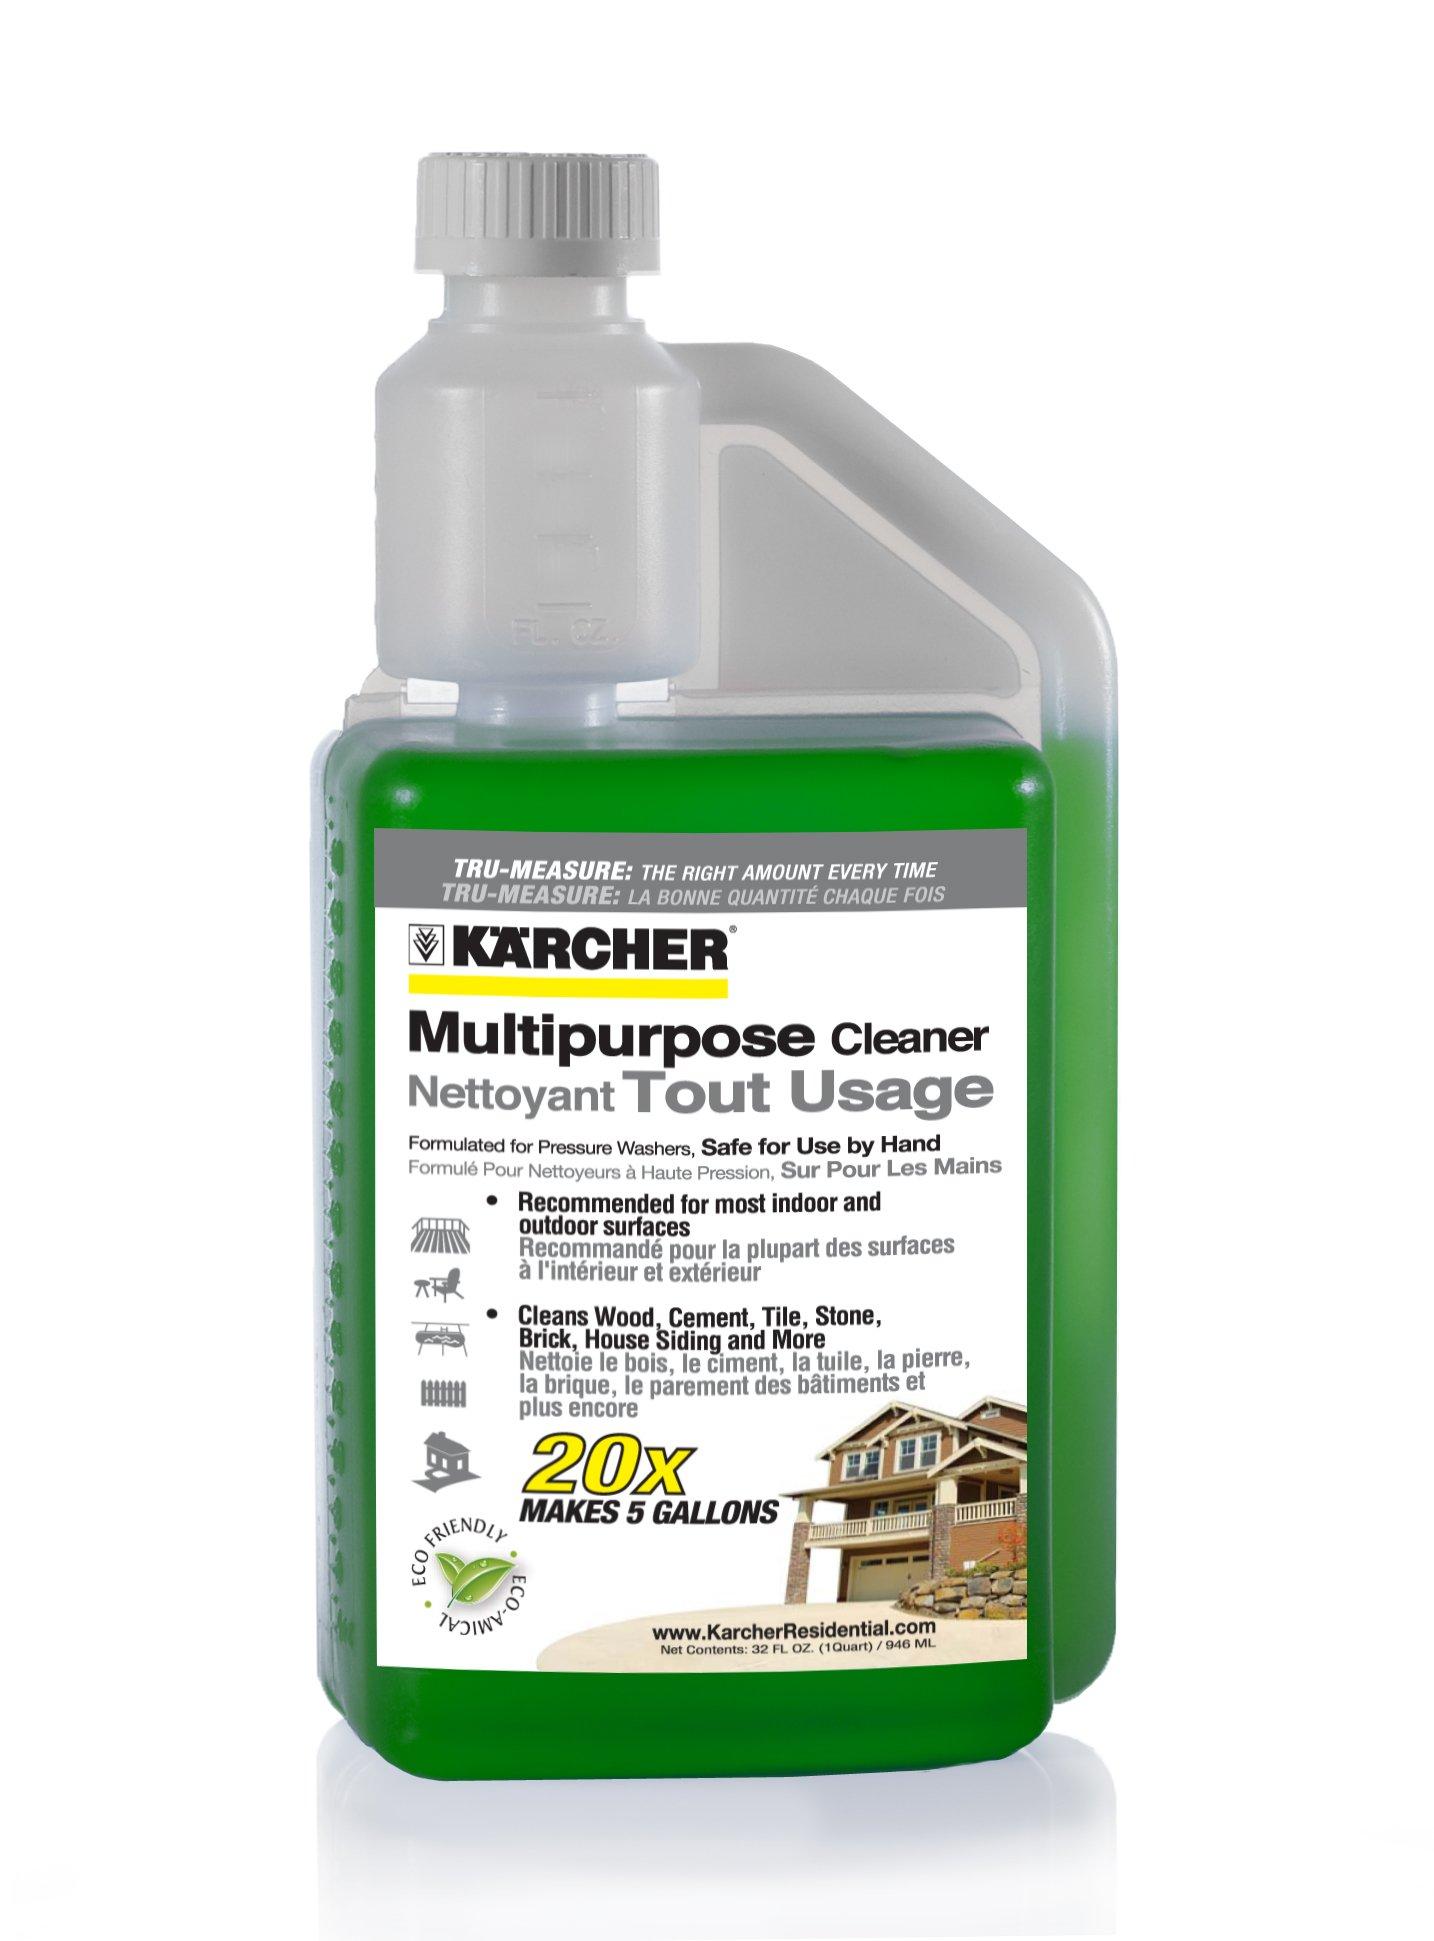 karcher-9.558-120.0-20x-multi-purpose-pressure-washer-detergent-cleaner-1-quart-best-pressure-washer-detergent-soap-reviews